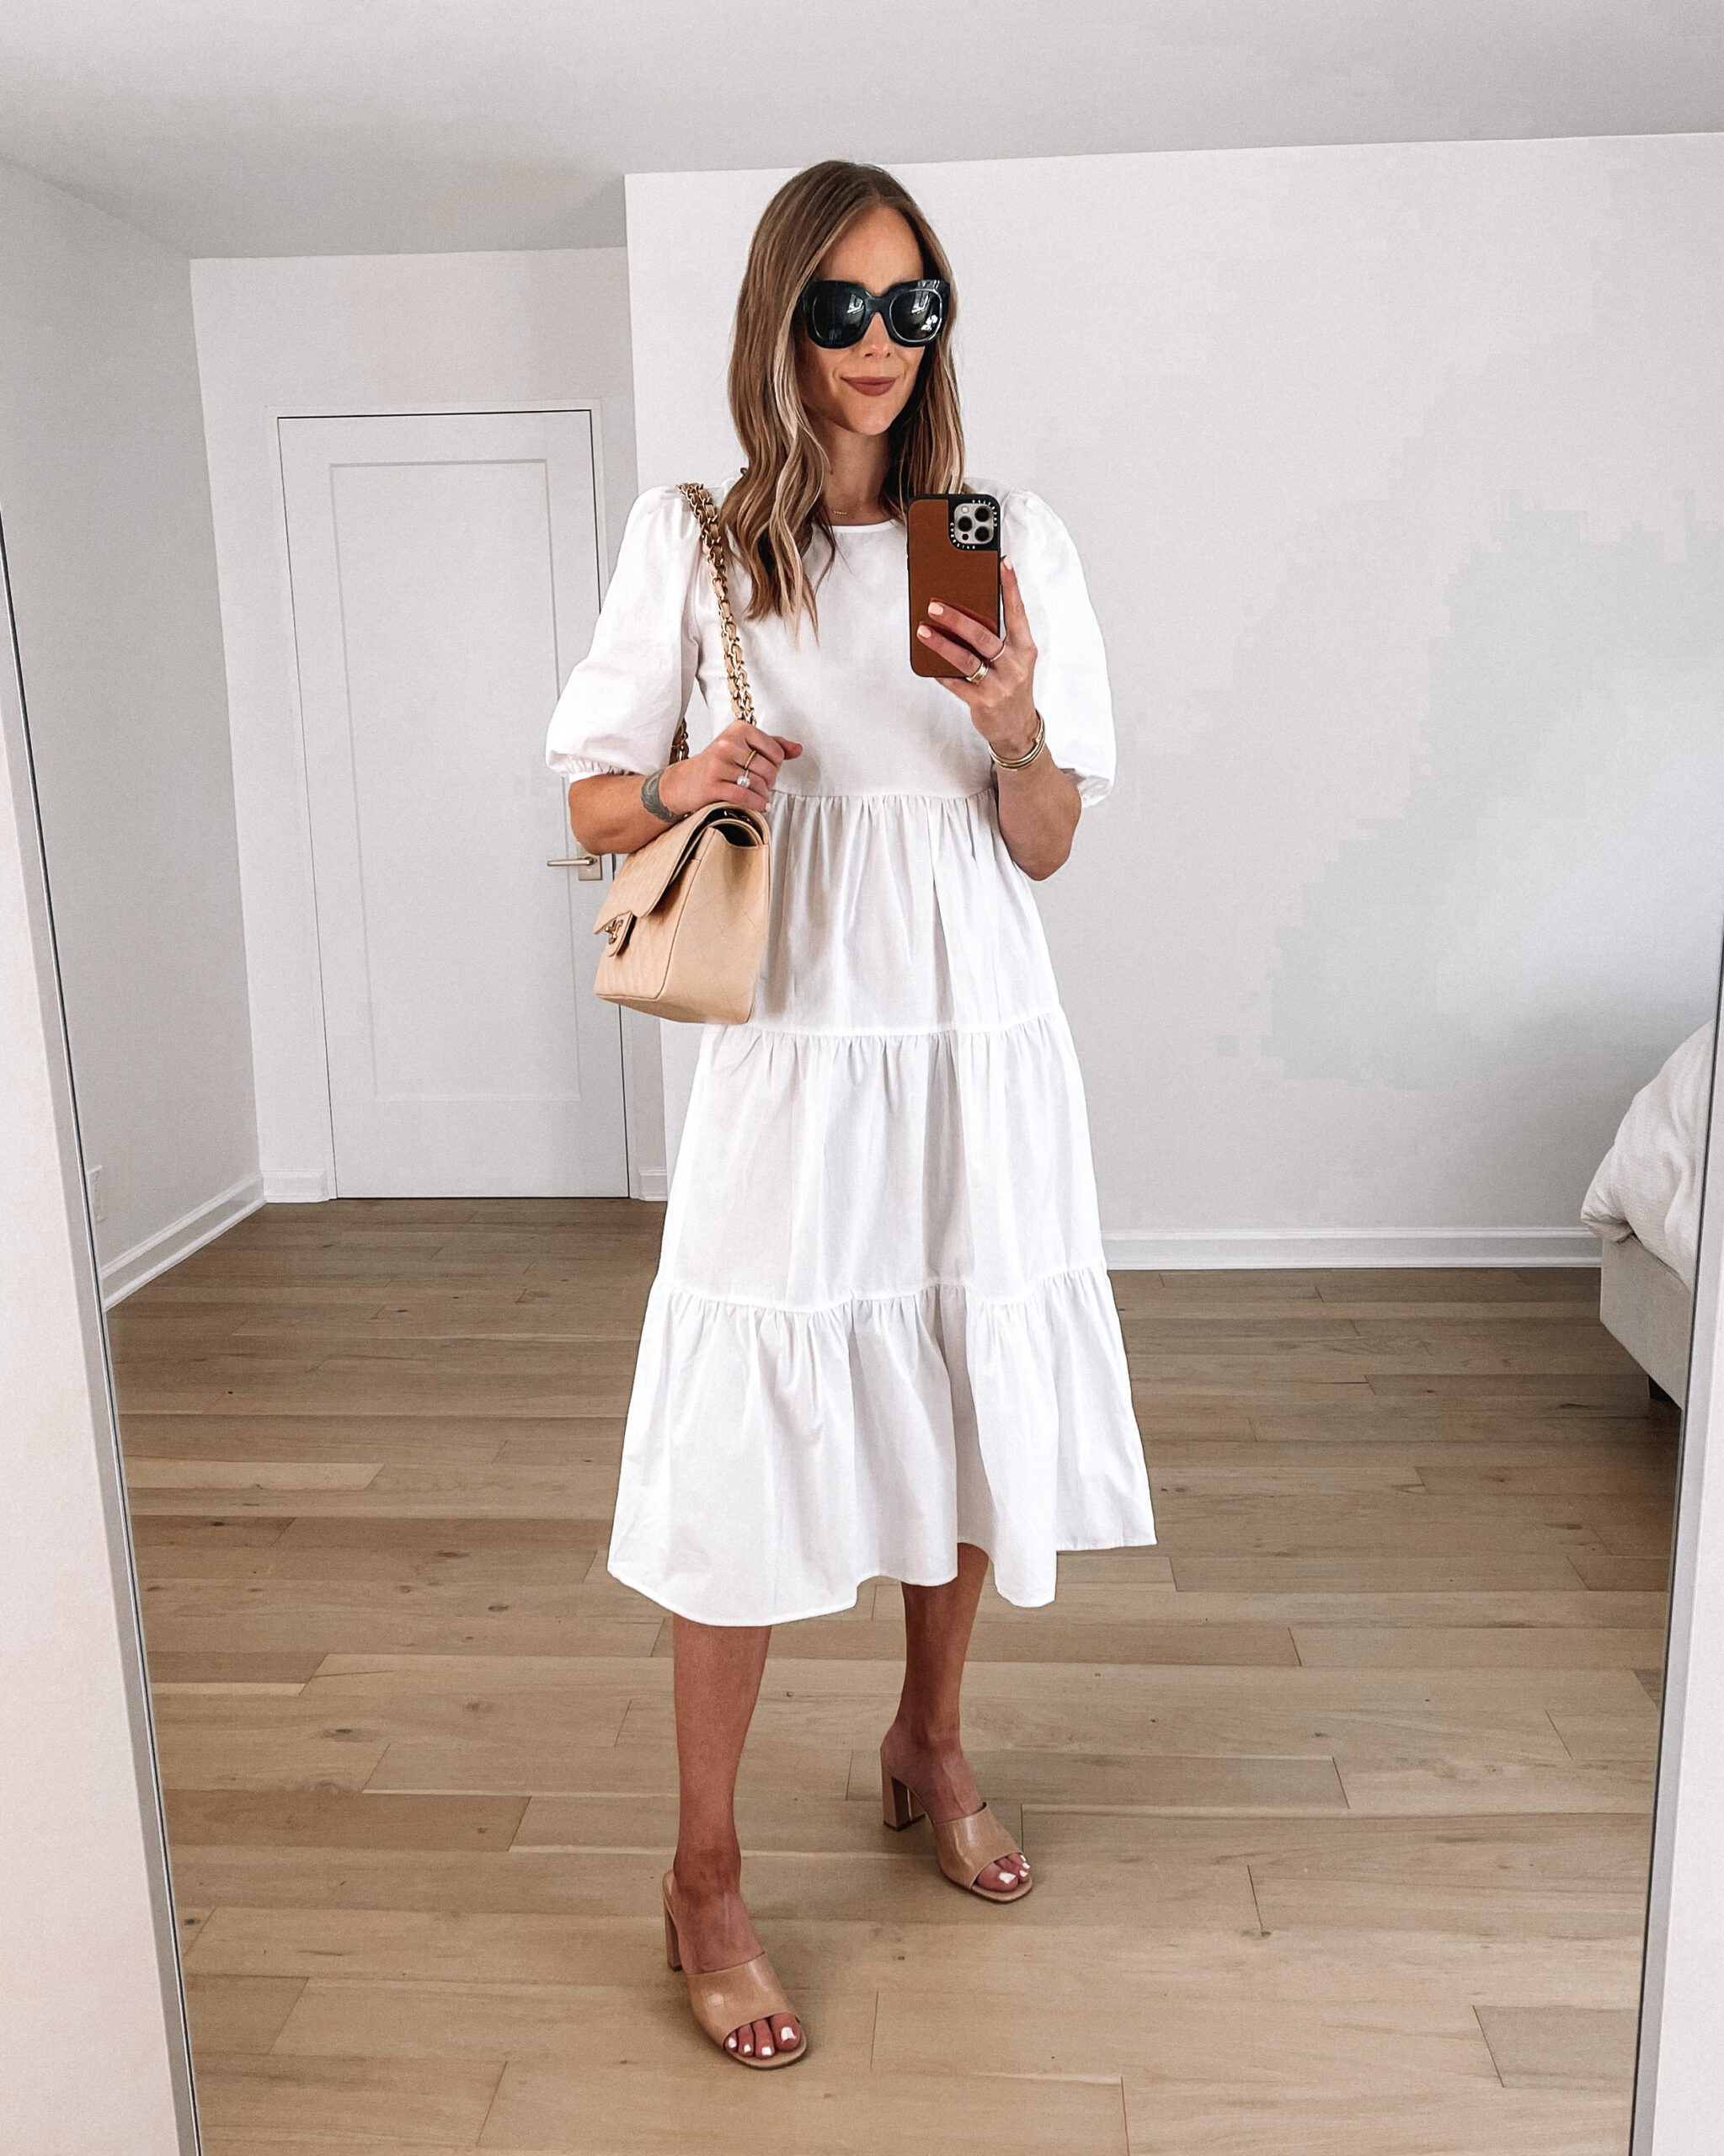 Fashion Jackson Wearing White Puff Sleeve Midi Dress Nude Sandals